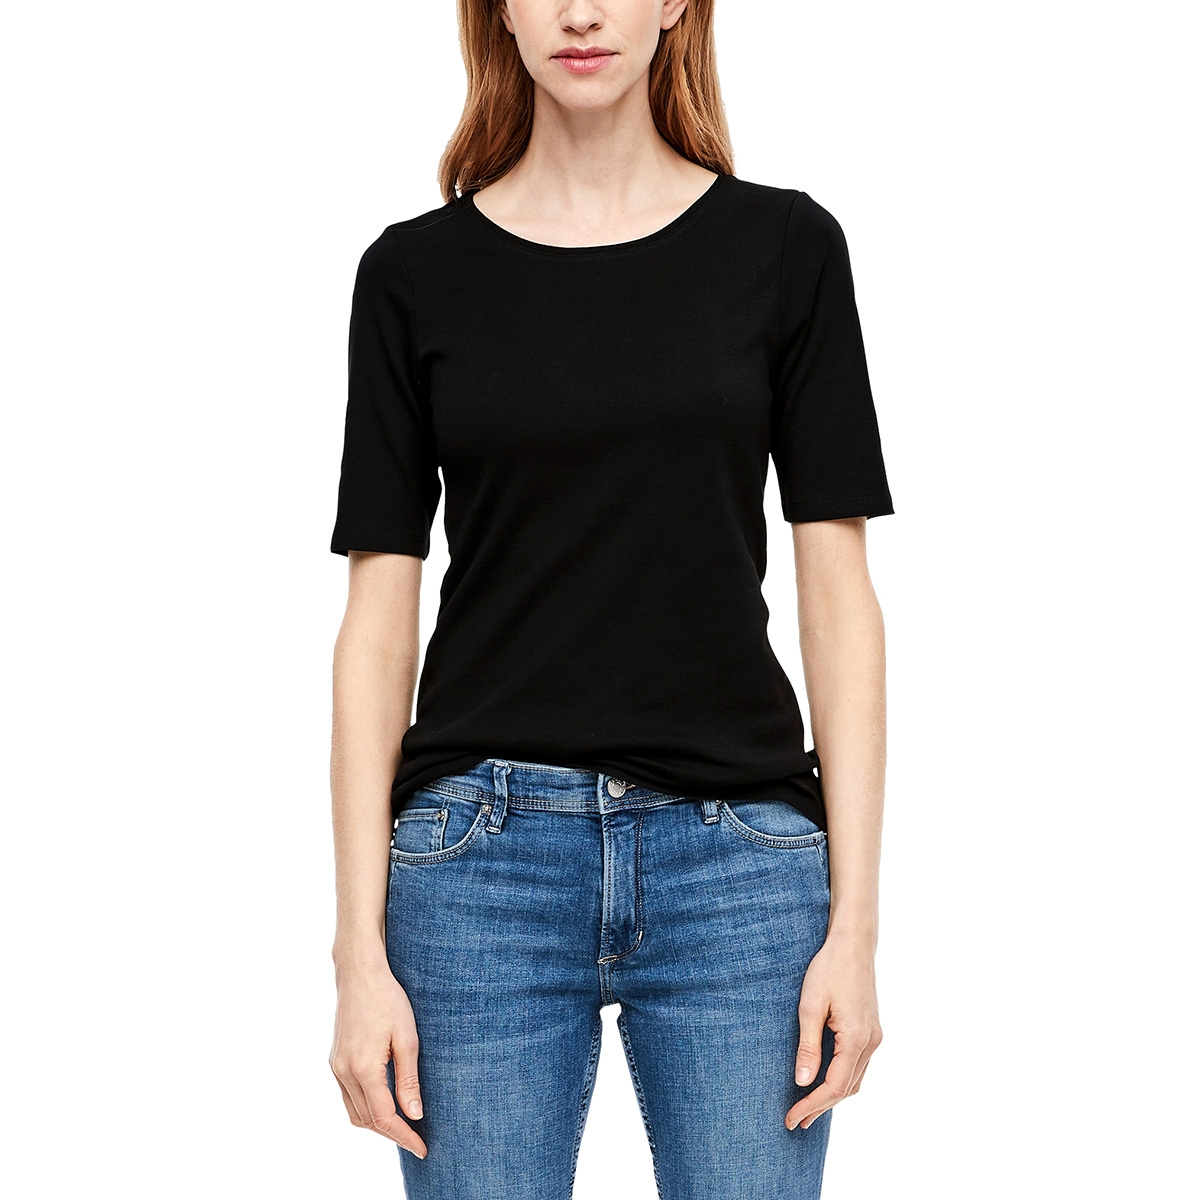 t shirt 04899326074 s.oliver t-shirt 9999